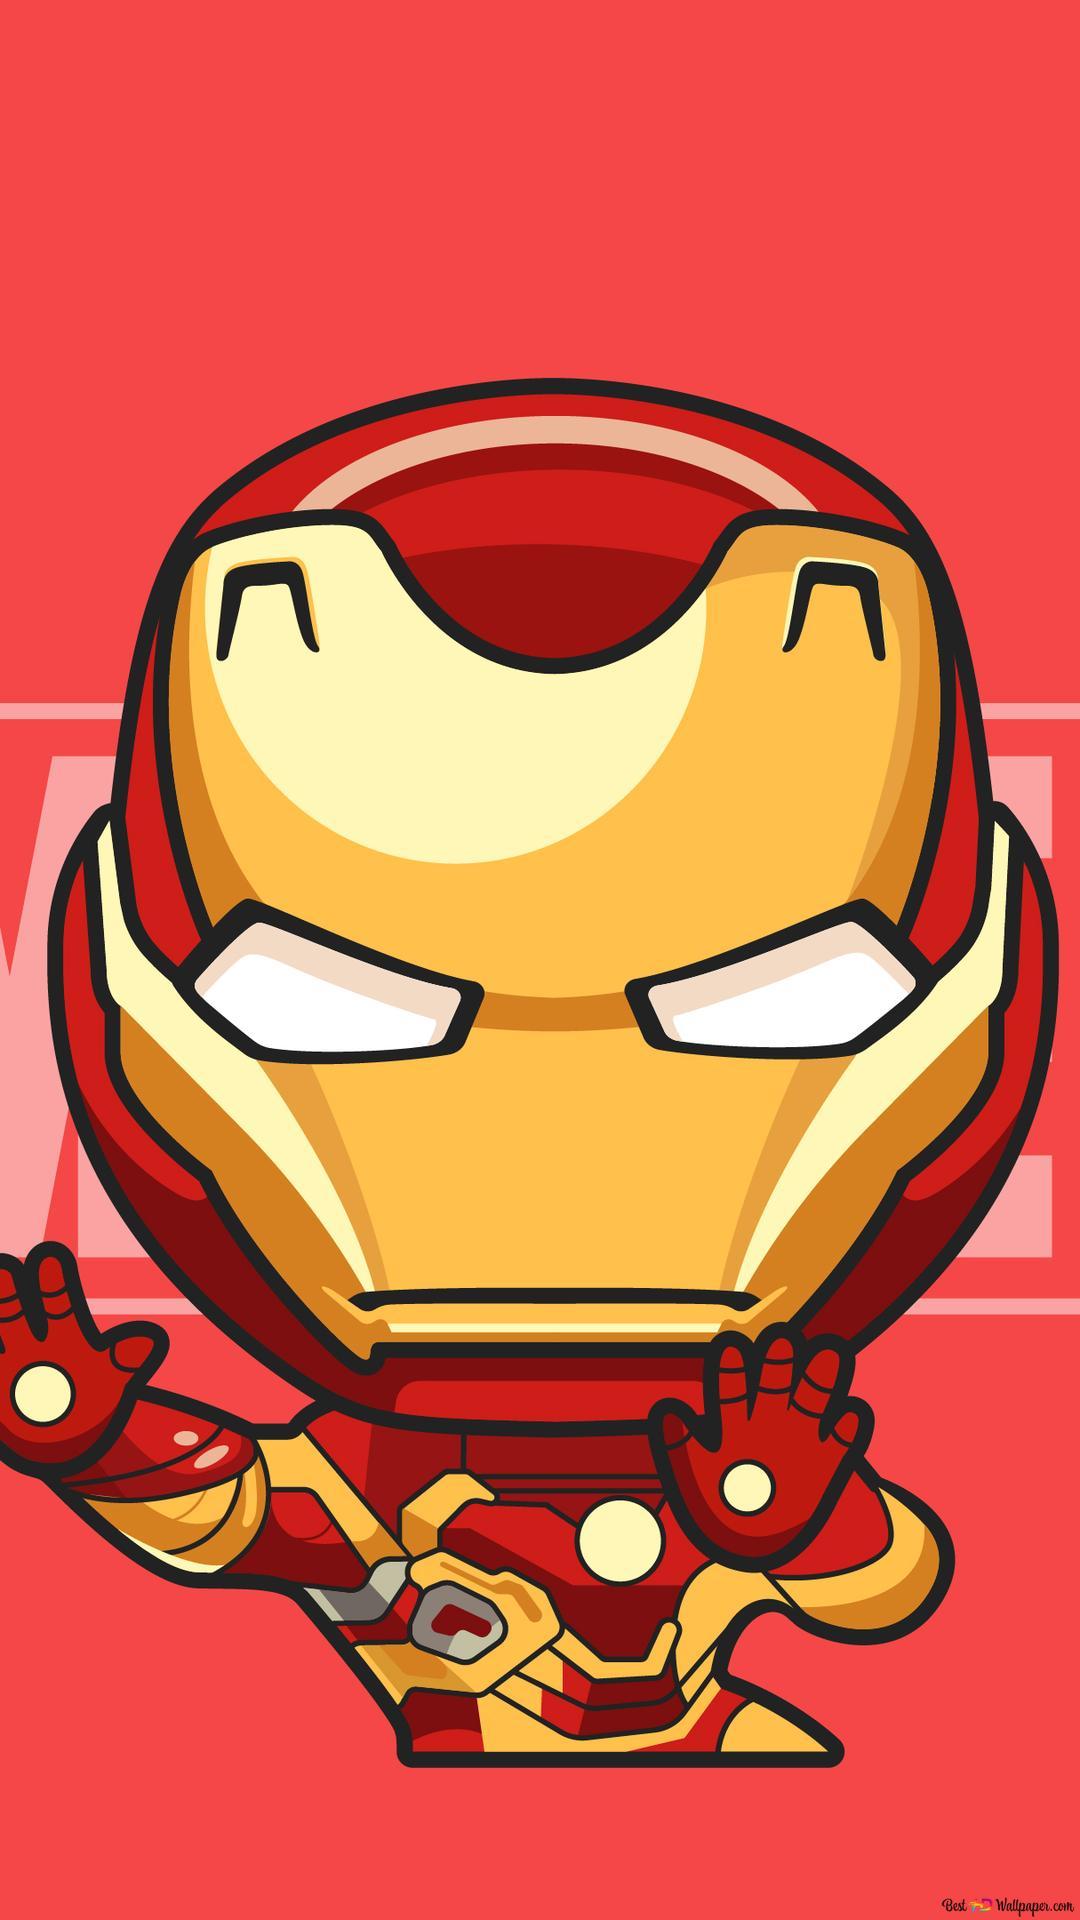 Avengers Iron Man Chibi Hd Hintergrundbilder Herunterladen